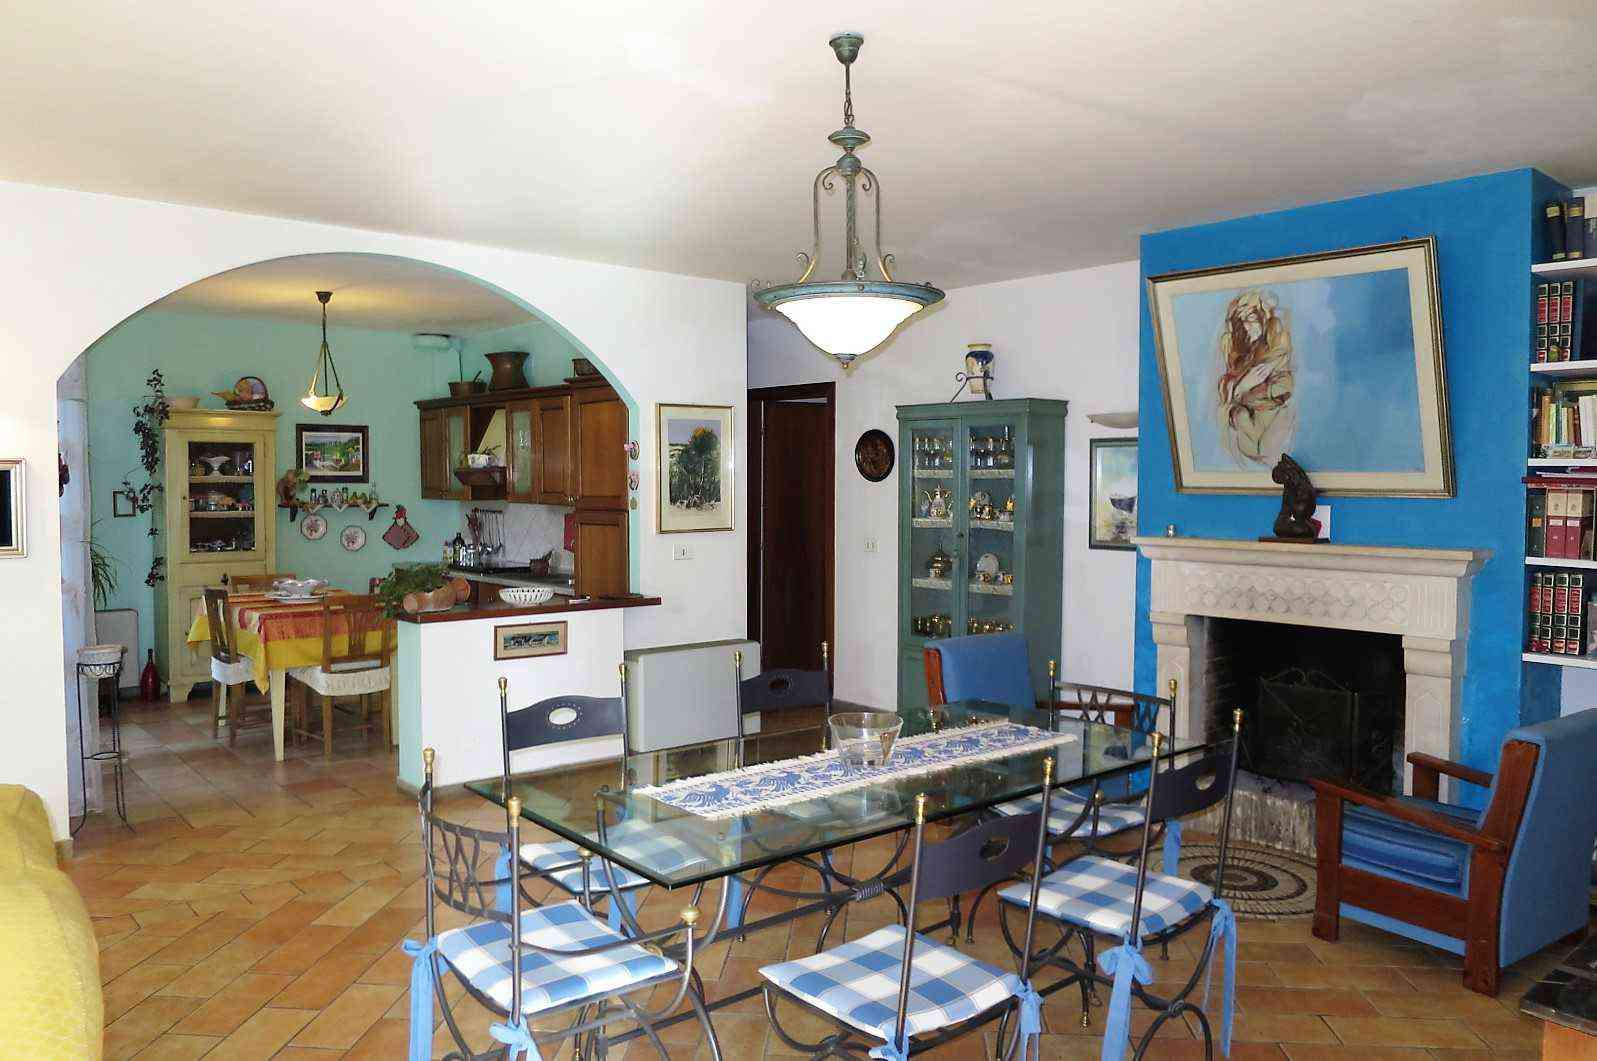 Villa Villa in vendita Atri (TE), Villa Paola - Atri - EUR 473.281 100